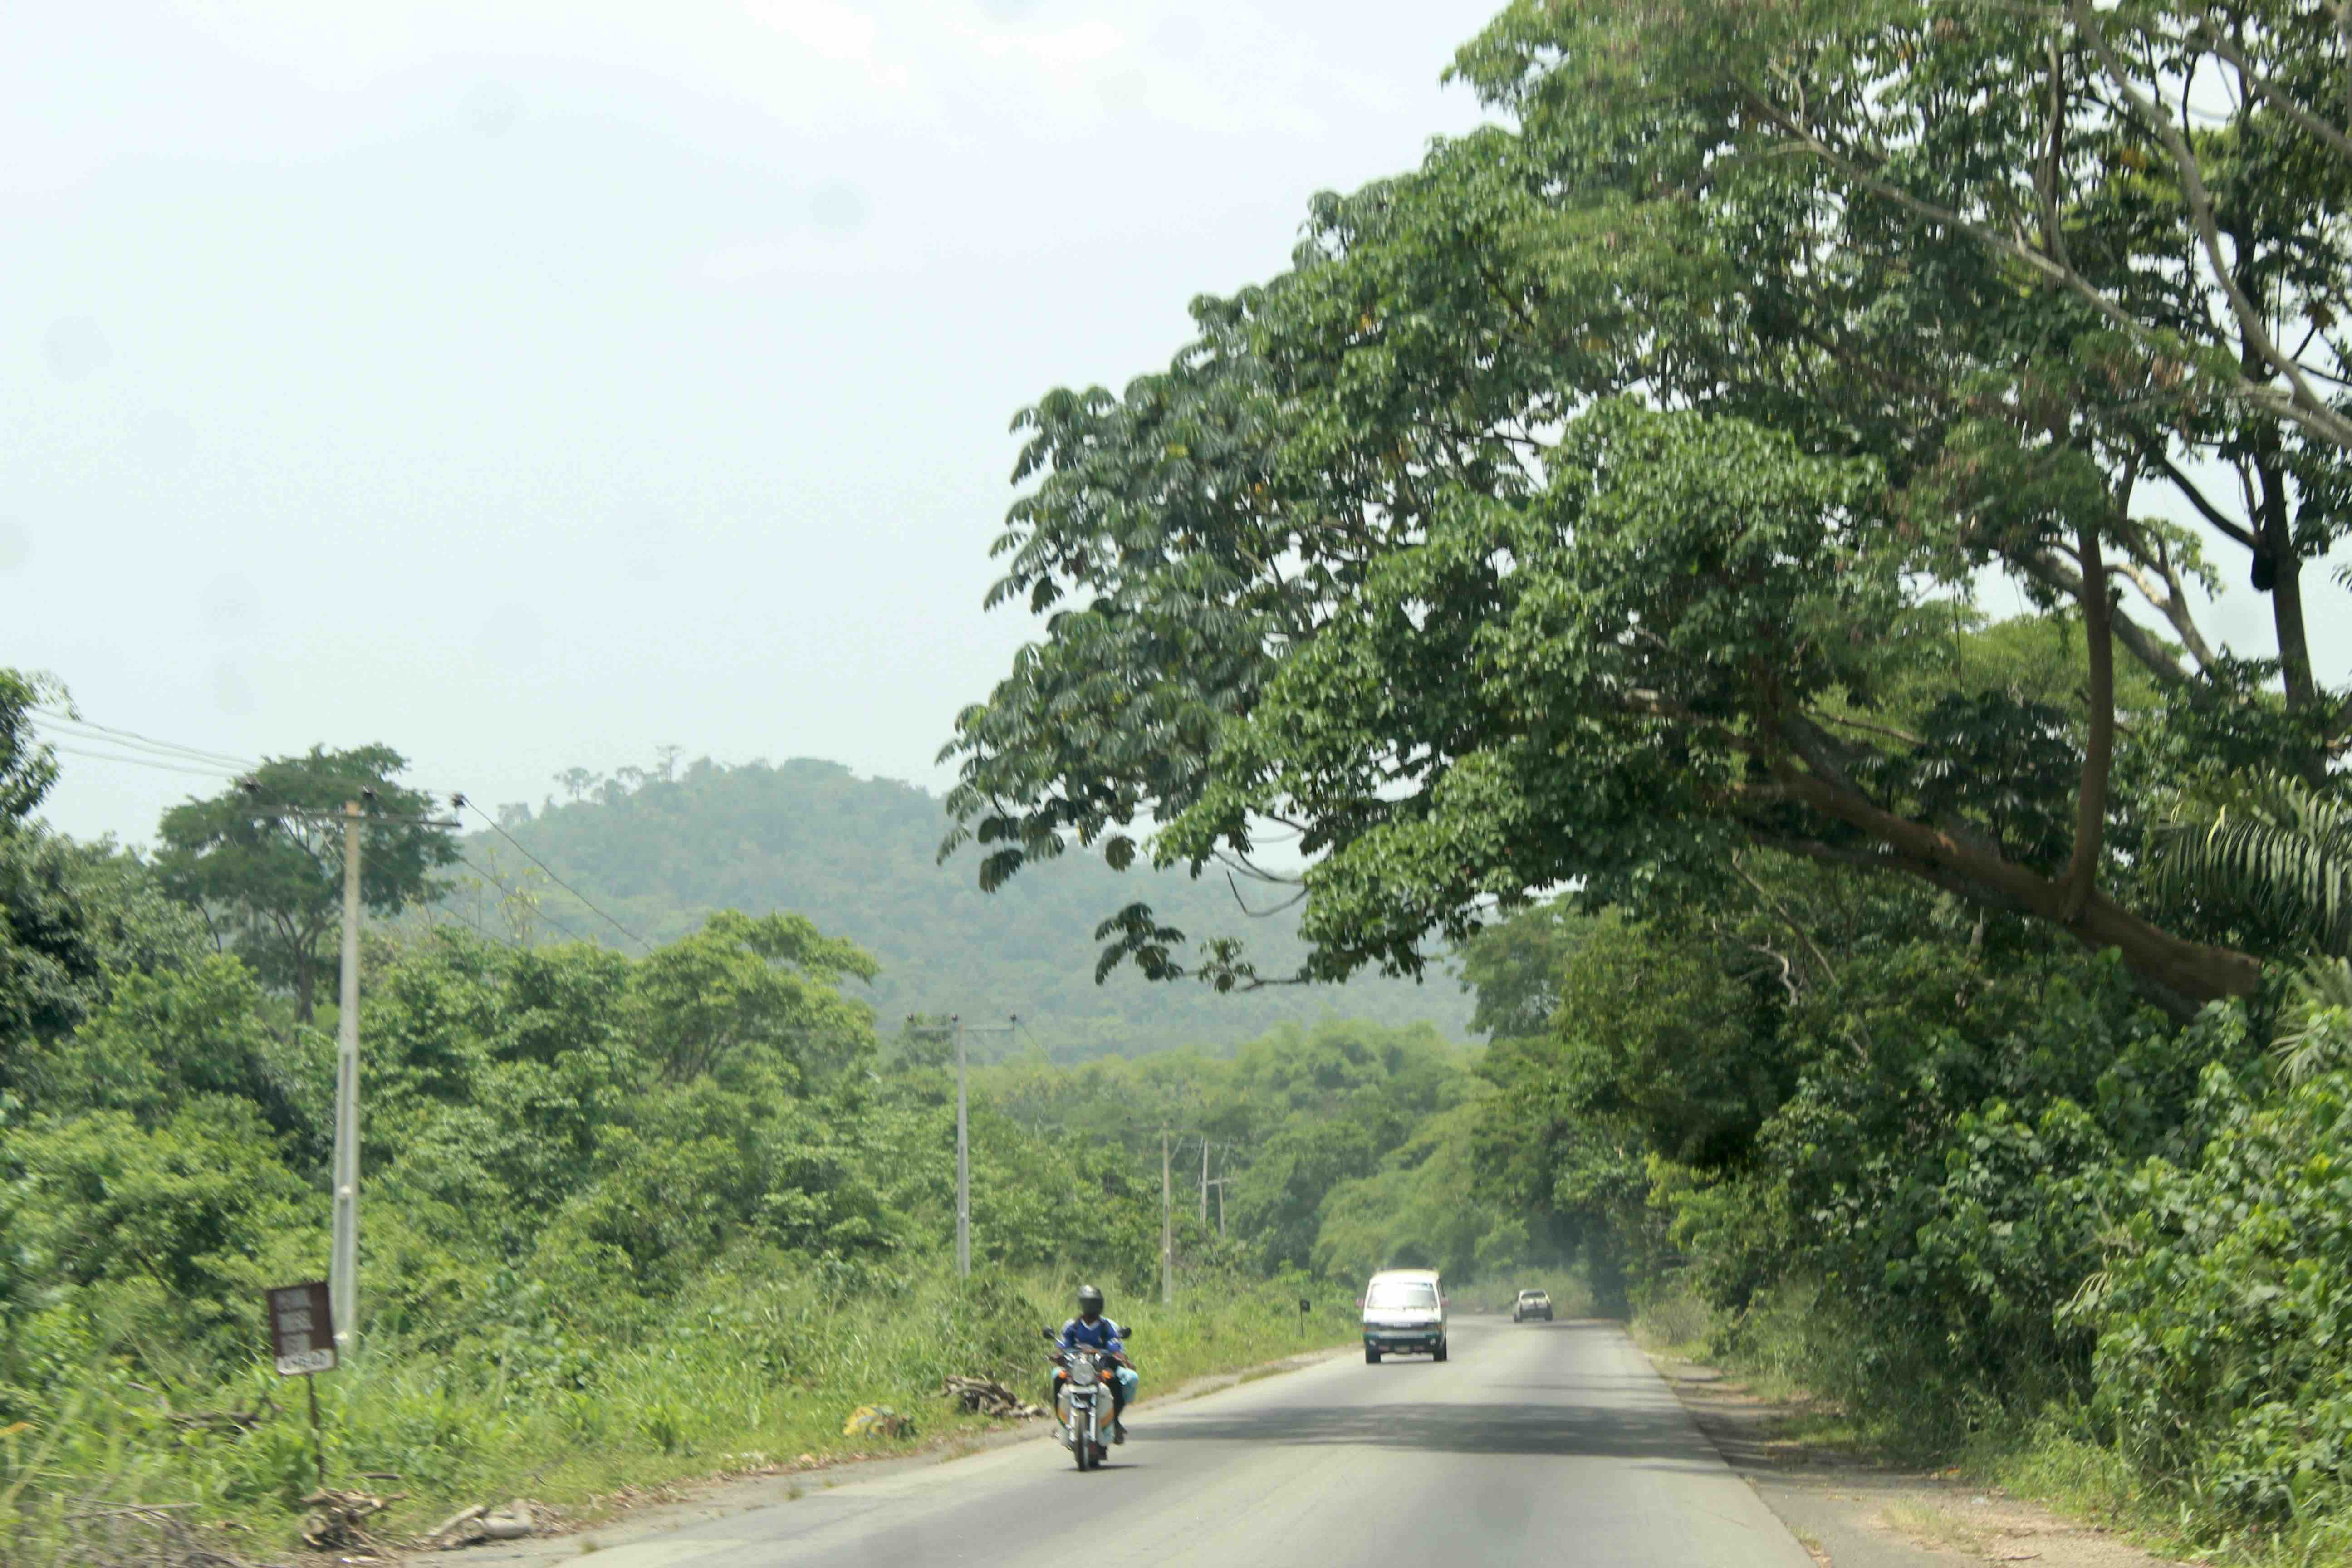 Ilesa-Akure Road, Osun State, Nigeria. #JujuFilms